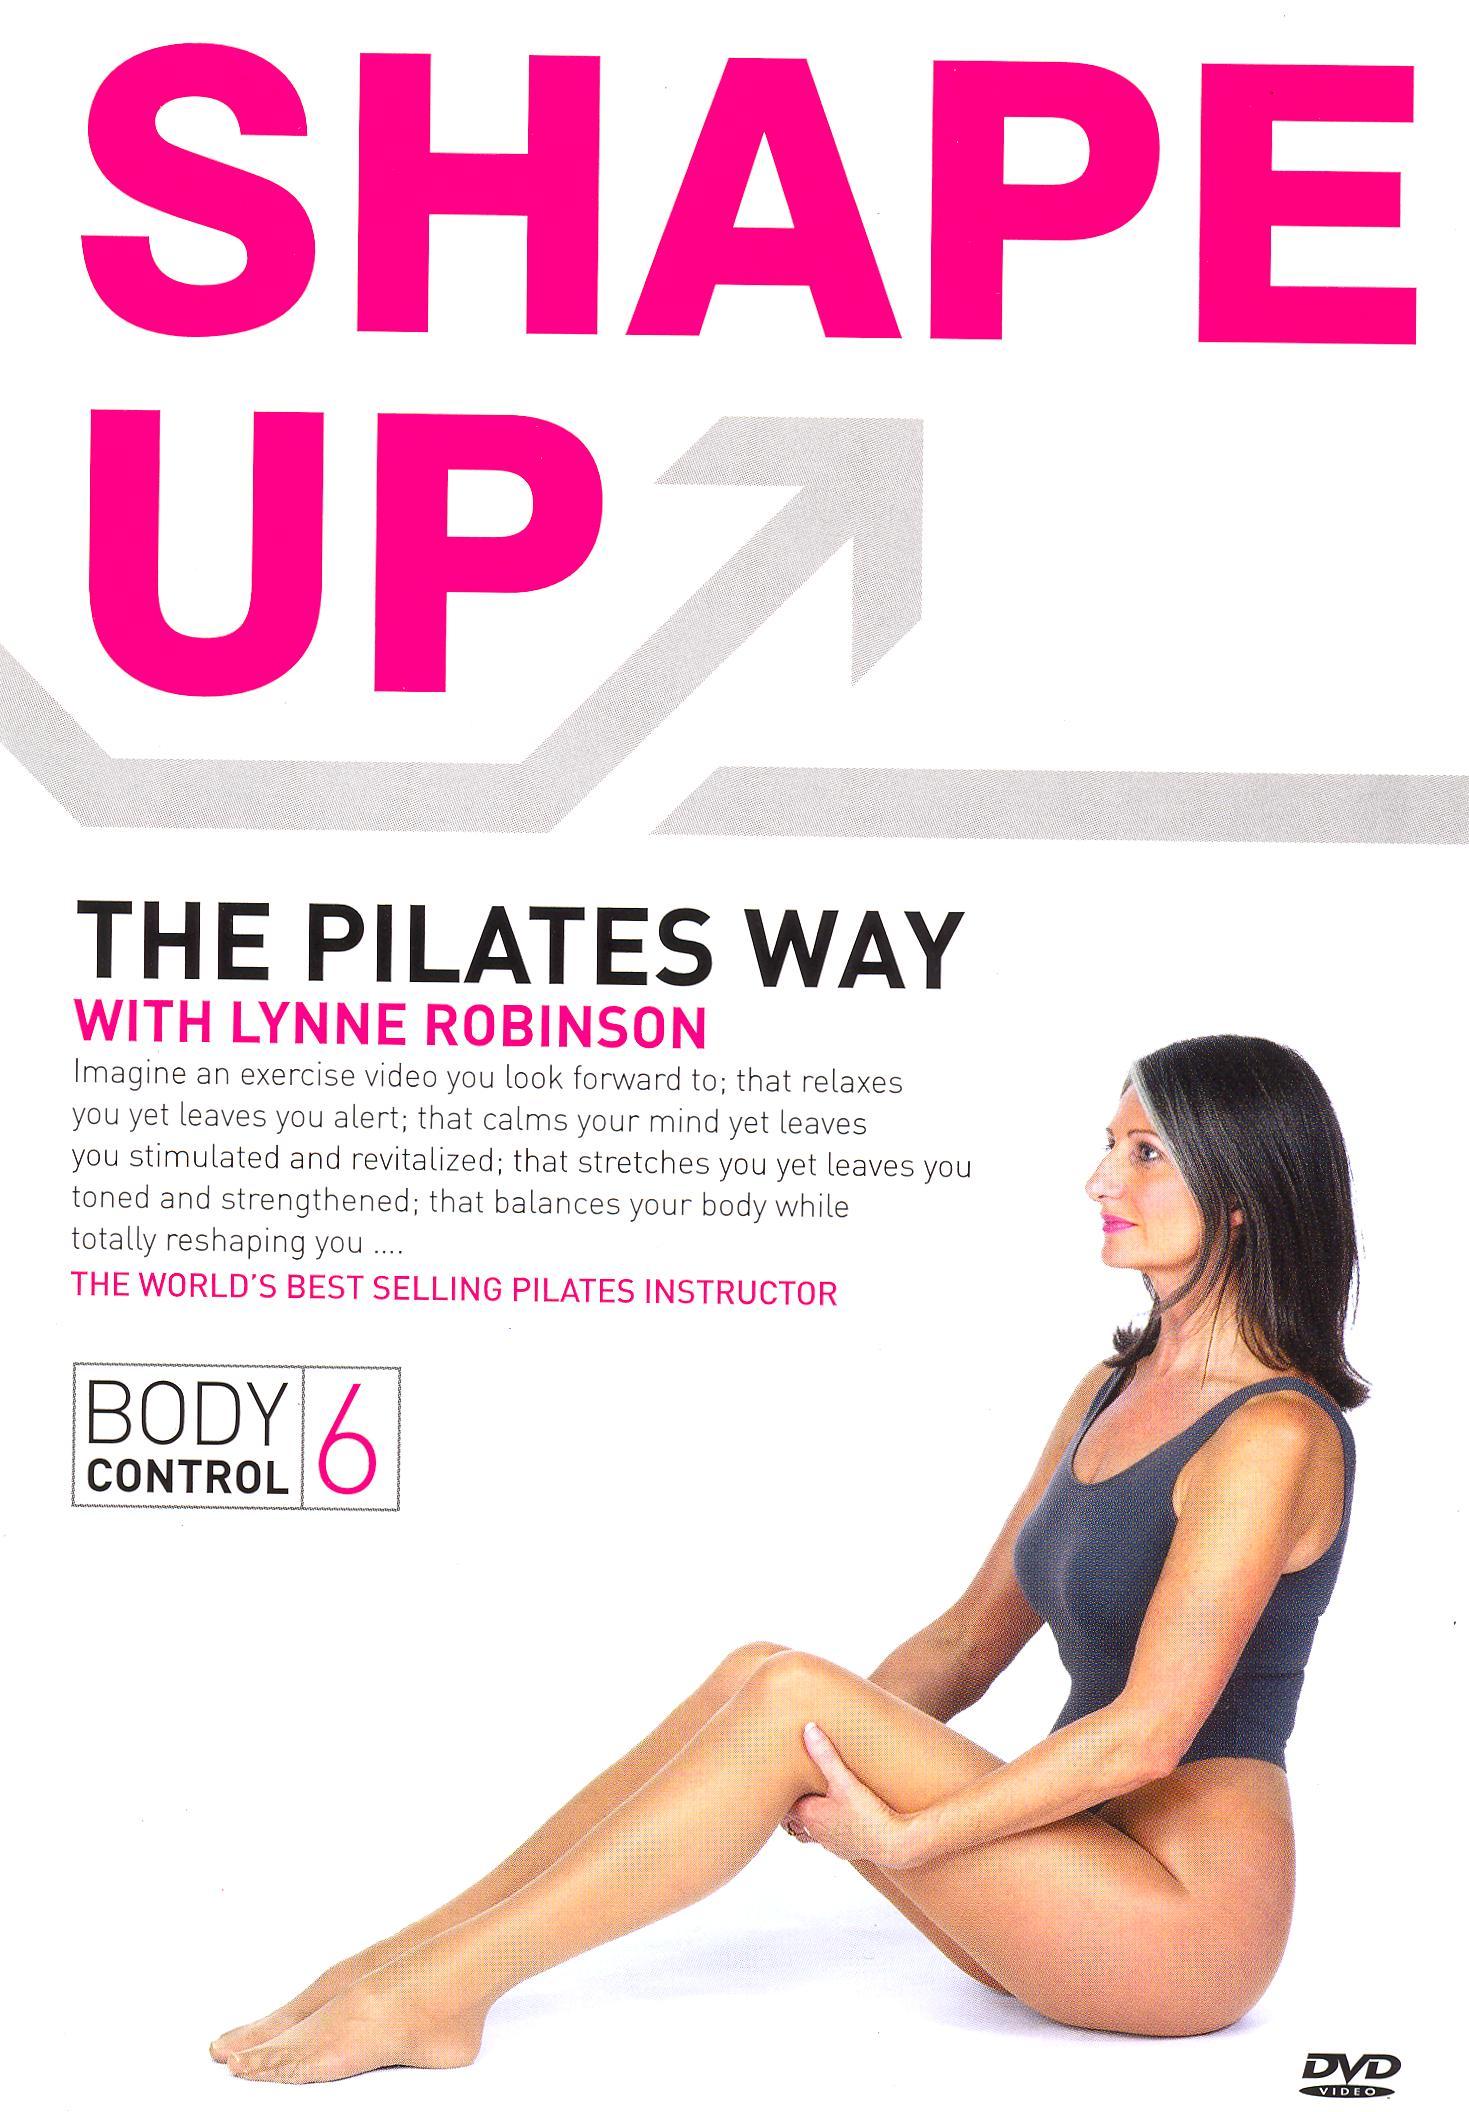 Lynne Robinson: Body Control 6 - Shape Up the Pilates Way